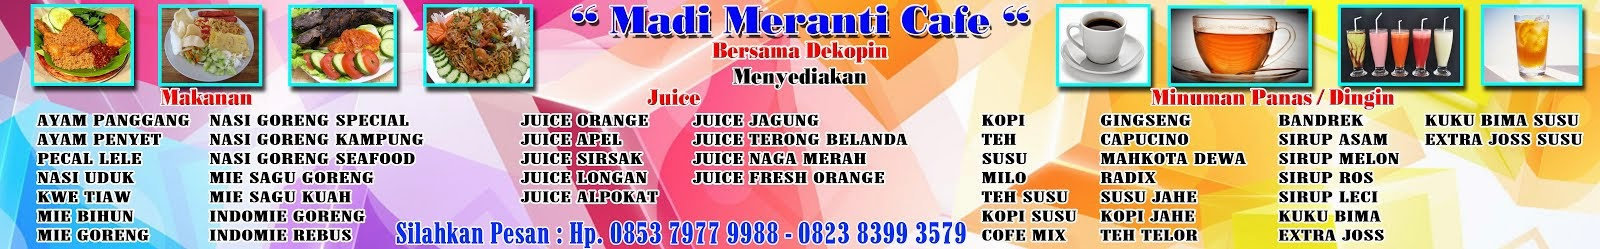 """Madi Meranti Cafe"""